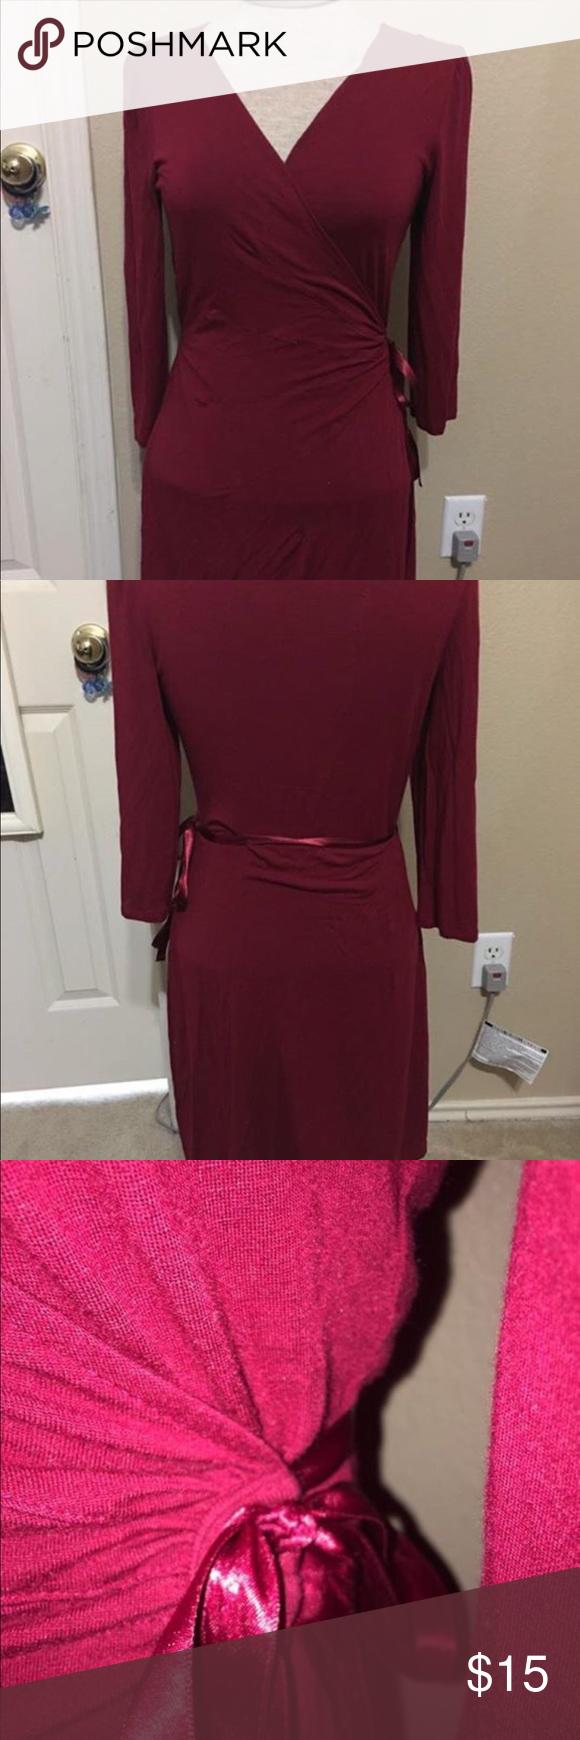 Express wrap dress beautiful comfy casual elegant red wrap dress